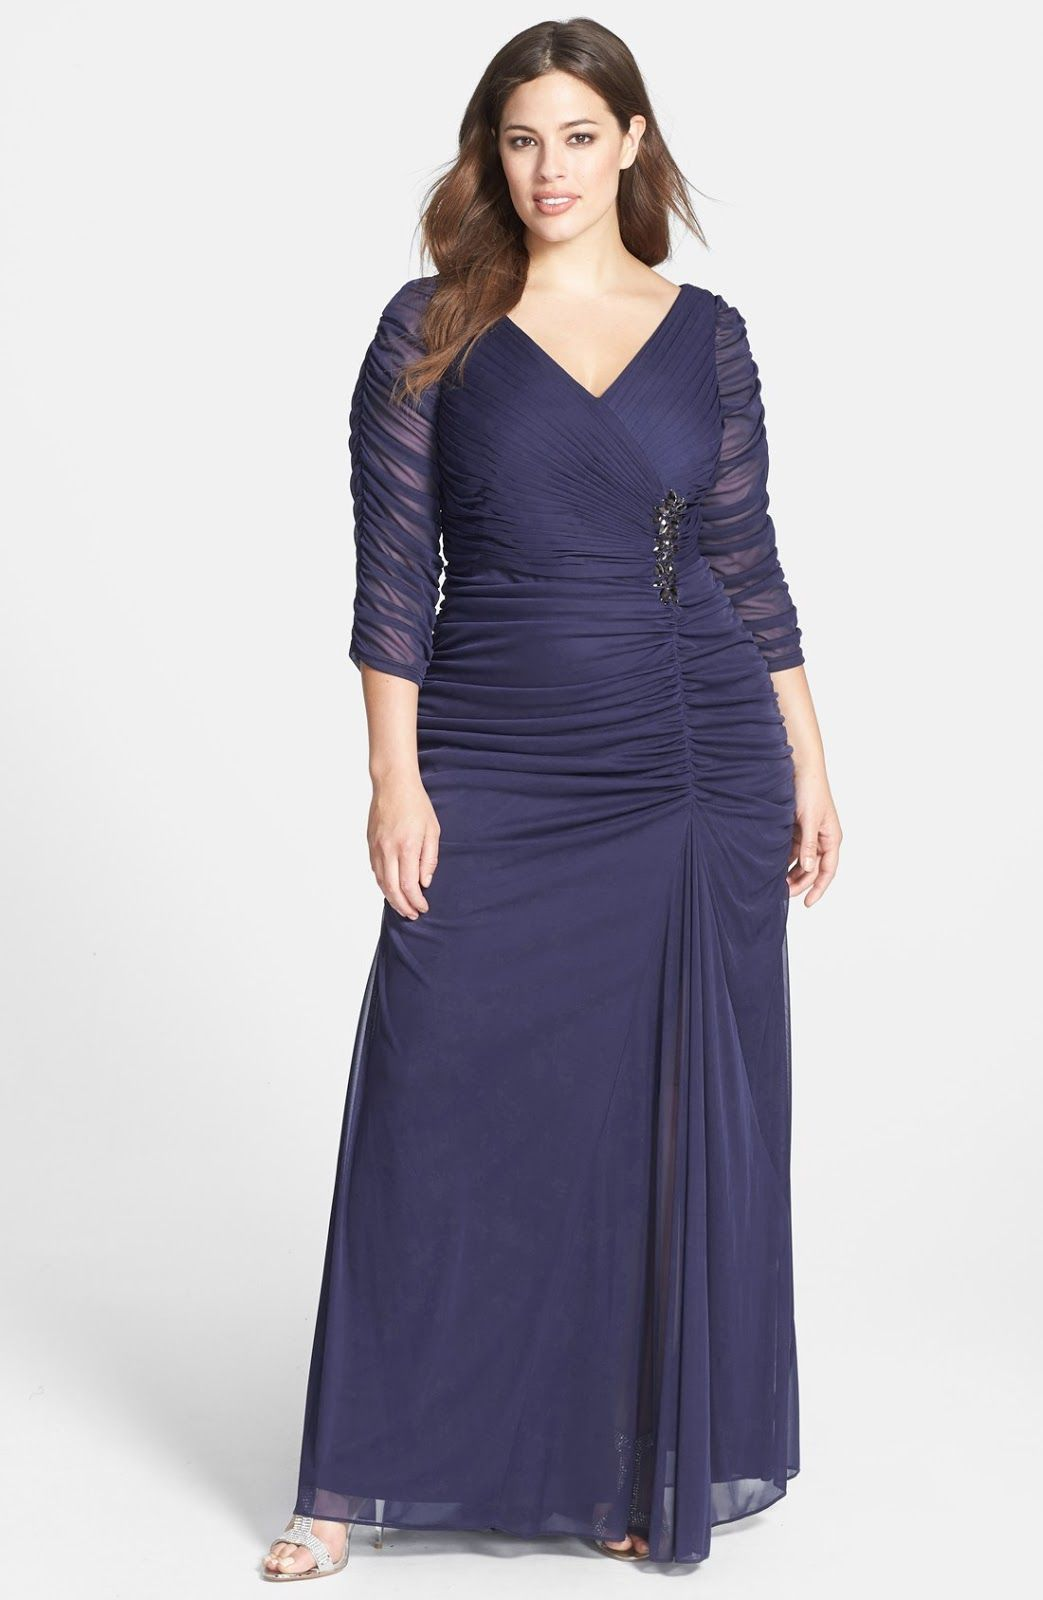 Vestidos largos de gorditas | Vestidos | Pinterest | Vestido largo ...